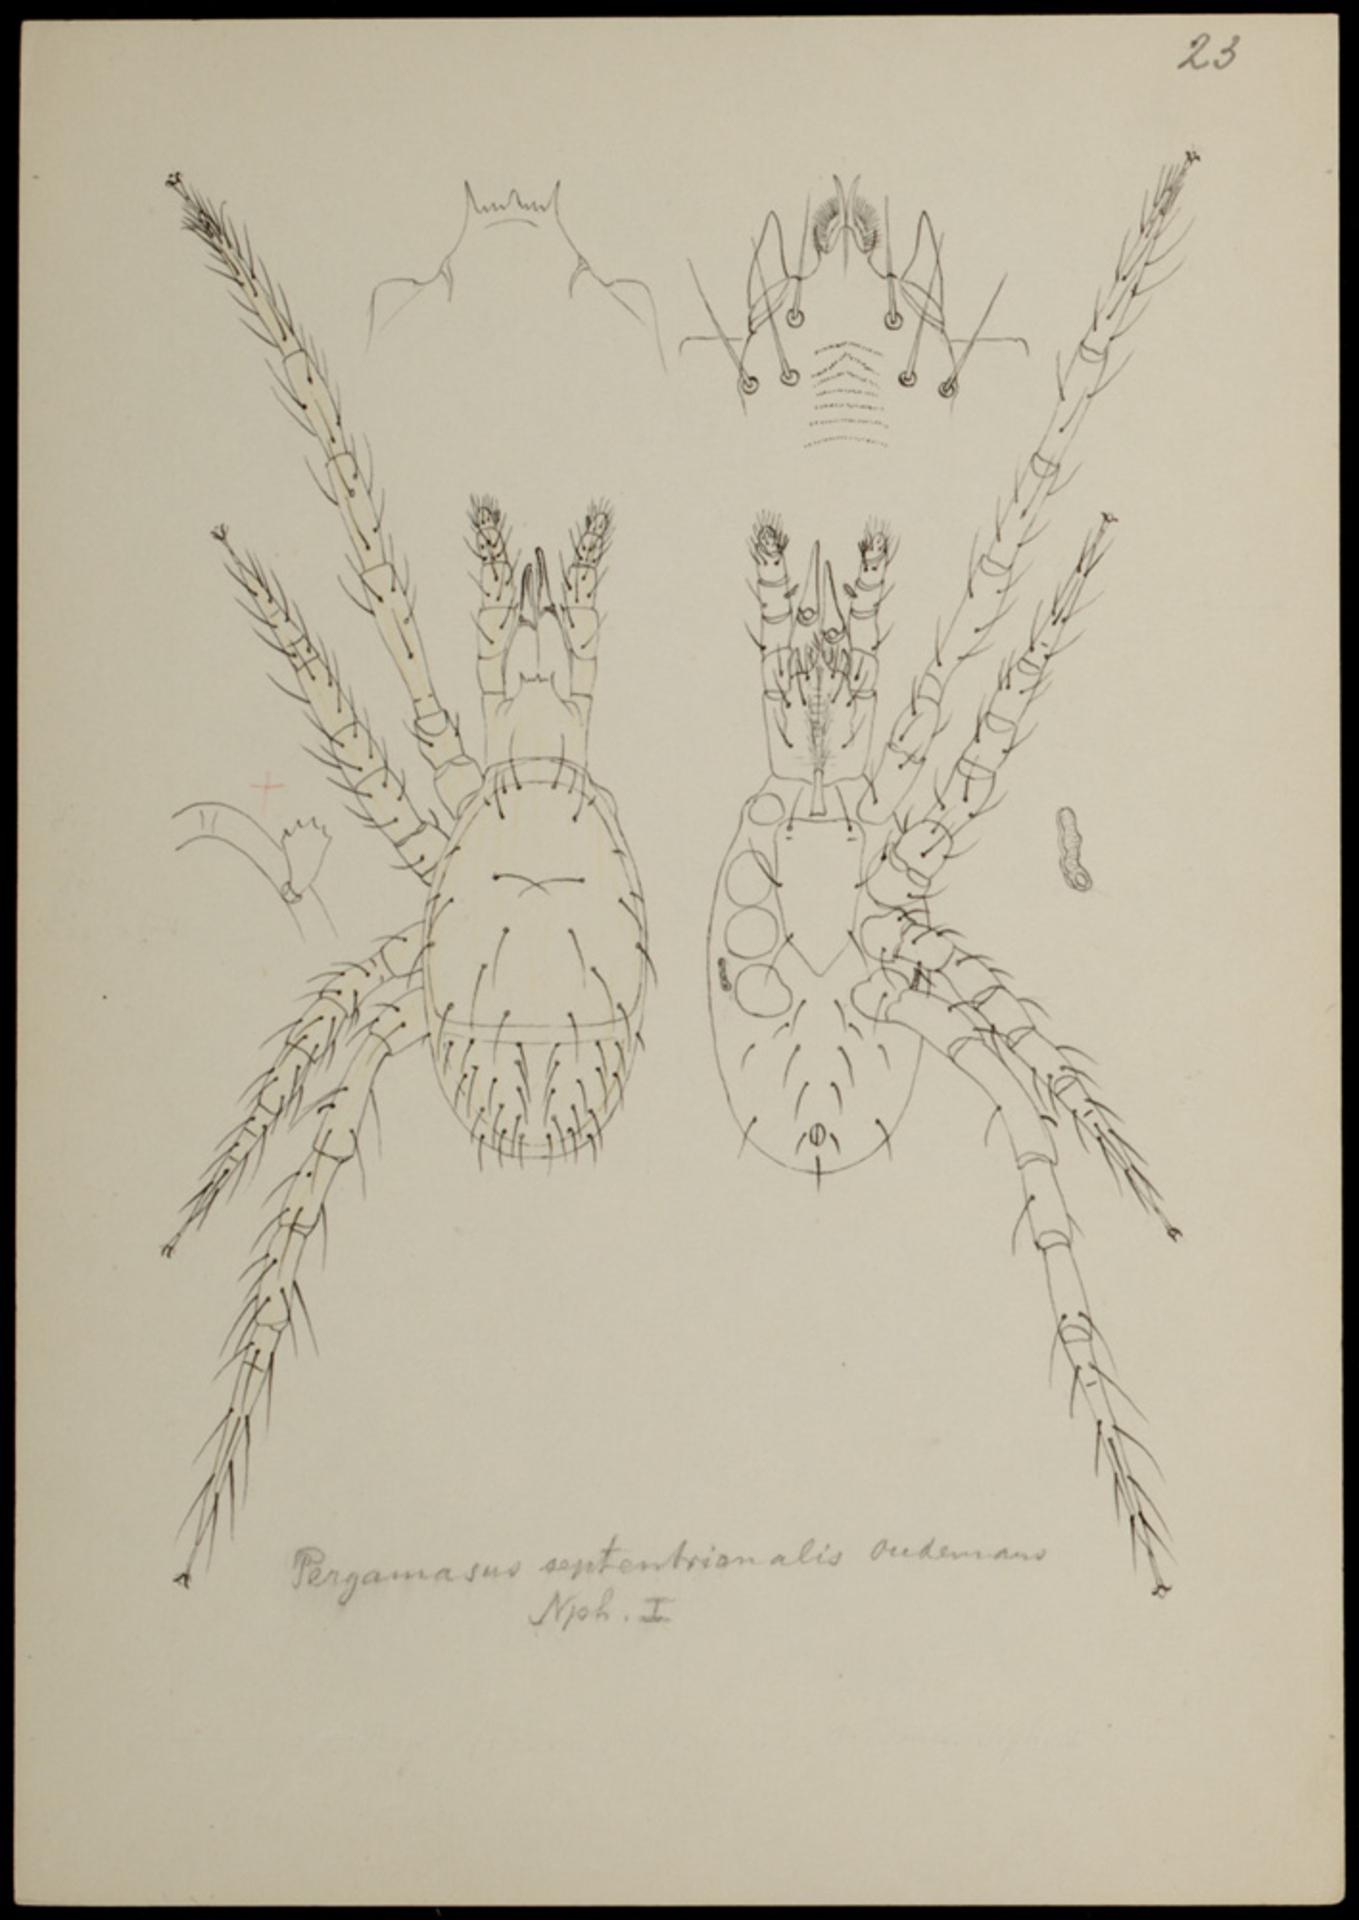 RMNH.ART.907 | Pergamasus septentrionalis (Oudemans)